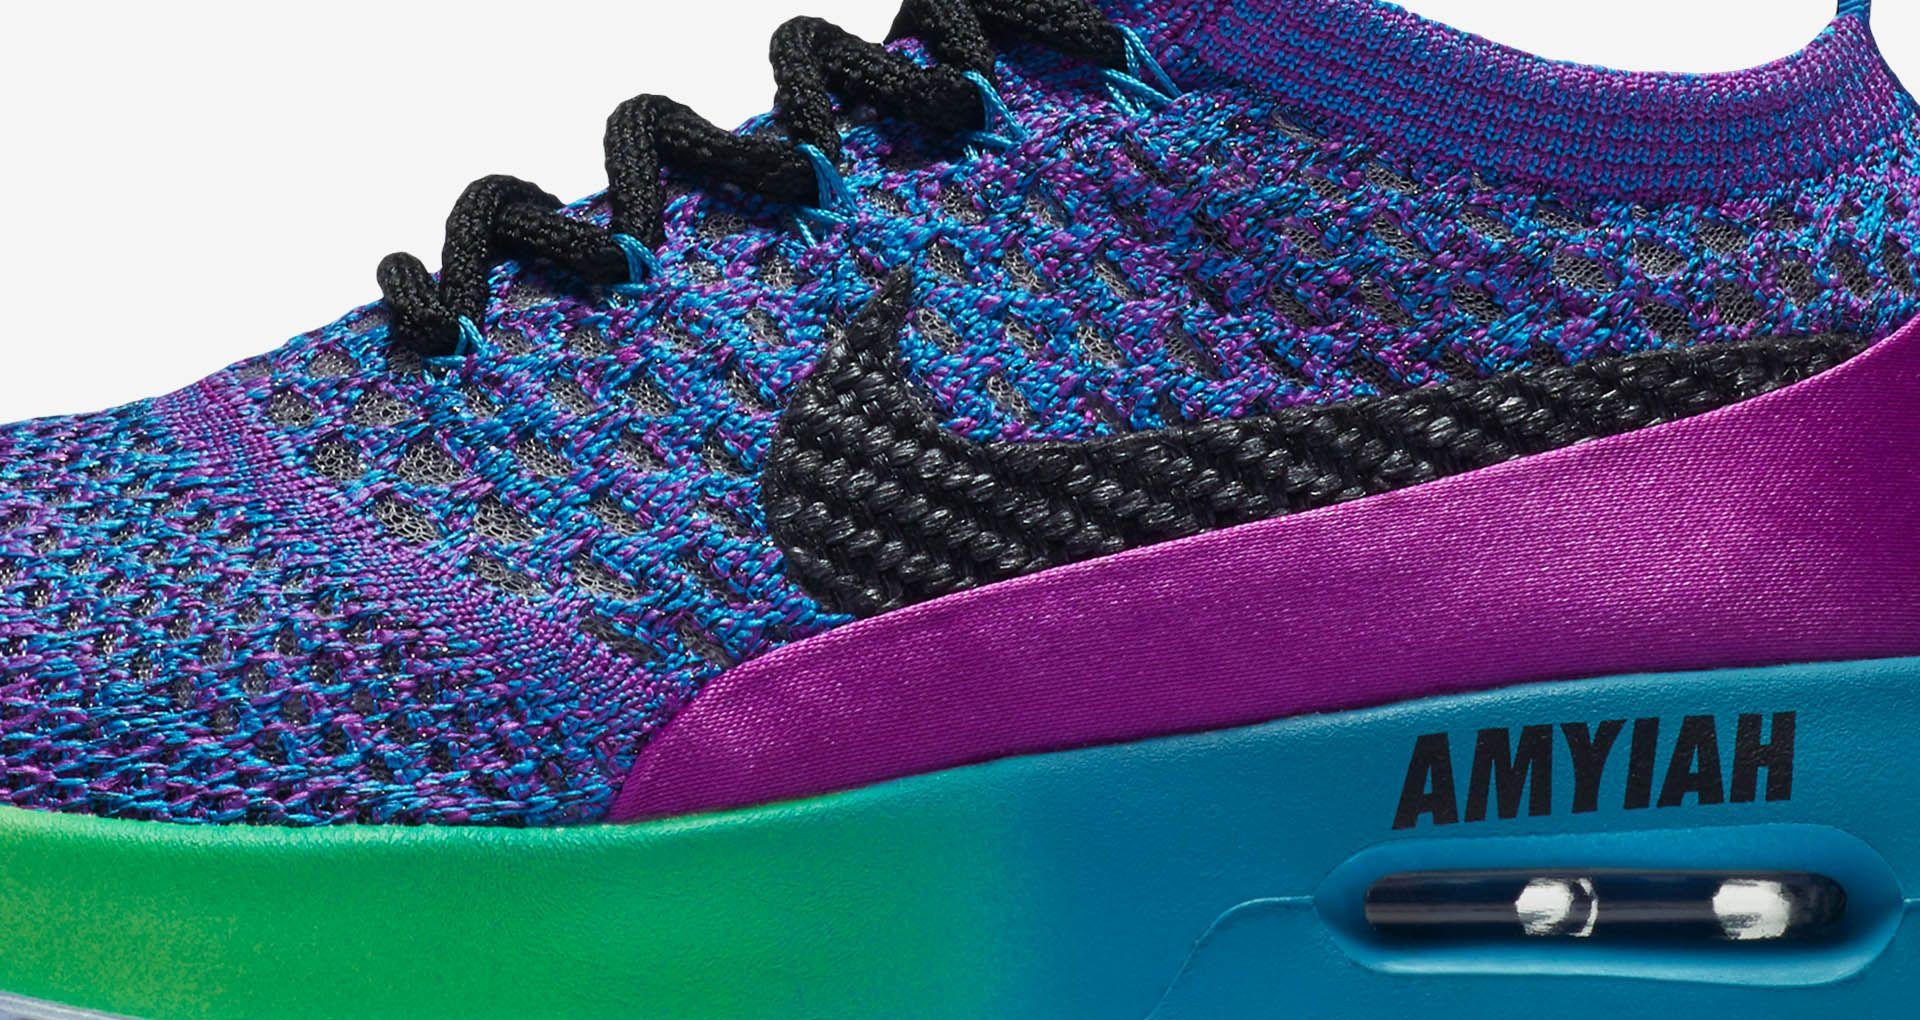 brand new 3bbe9 2adf5 Women s Nike Air Max Thea Ultra Flyknit Doernbecher Freestyle 2017  Vivid  Purple   Blue Orbit